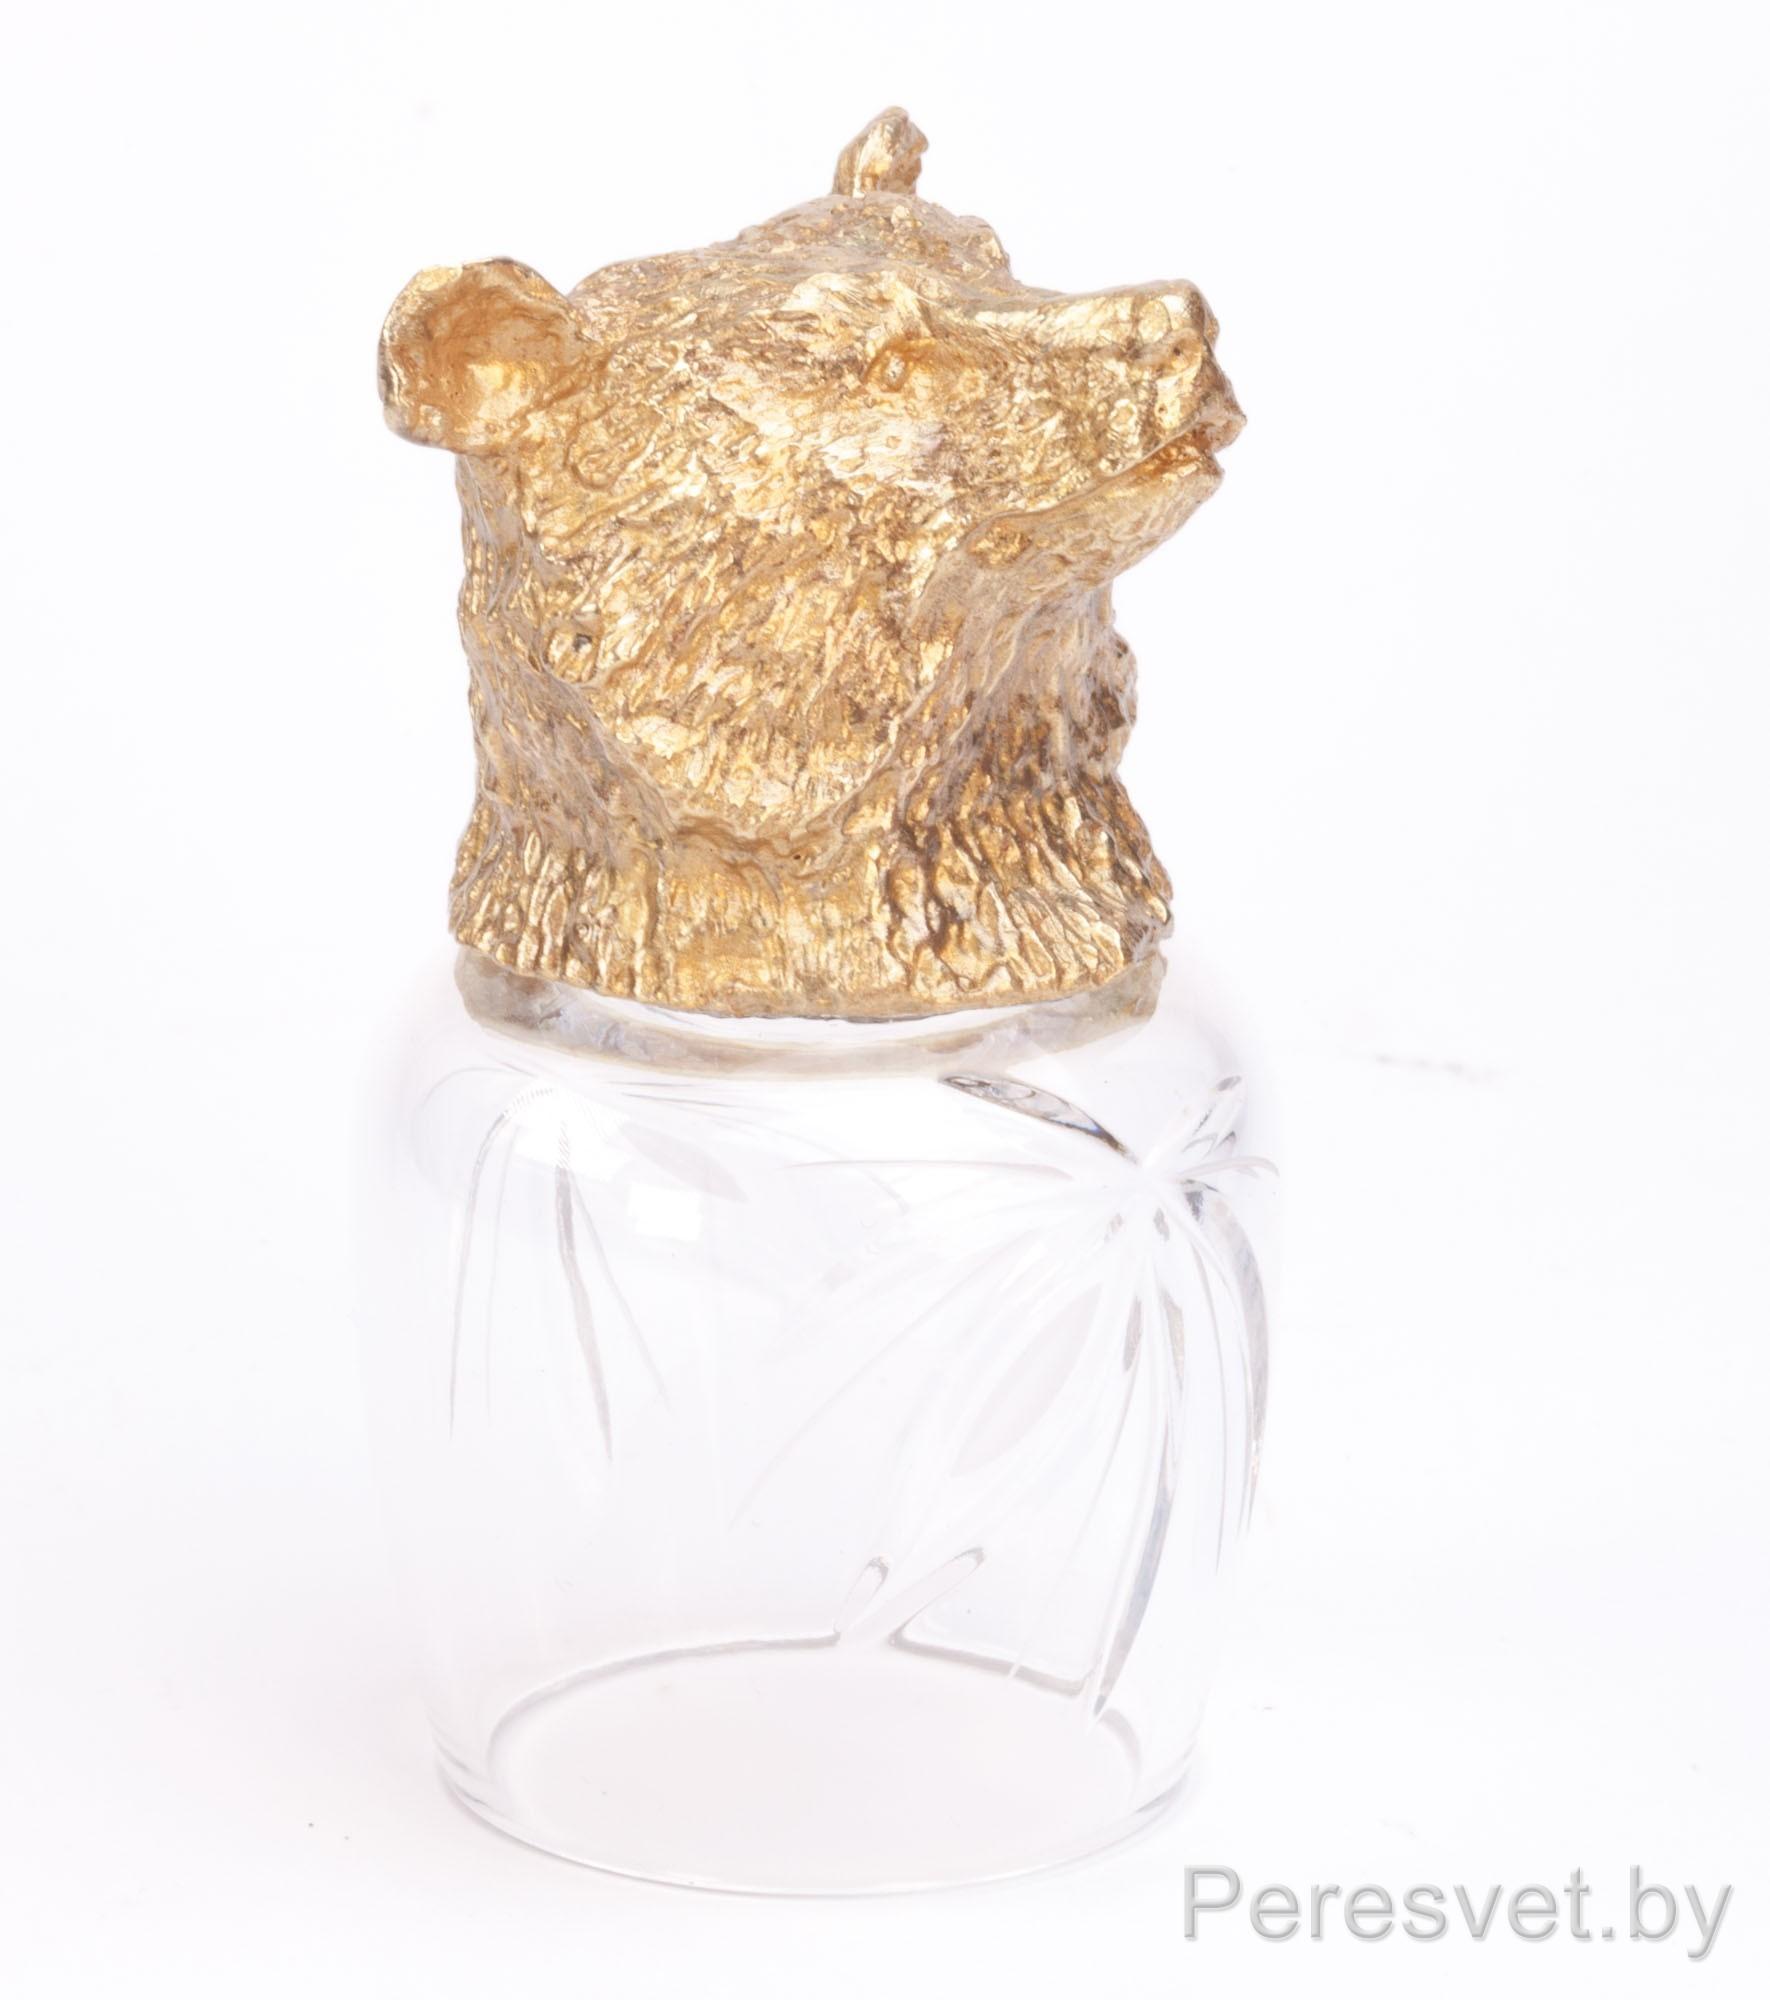 Рюмка перевертыш Охотничьи трофеи Медведь hunting glasses Бронза(золото) на peresvet.by